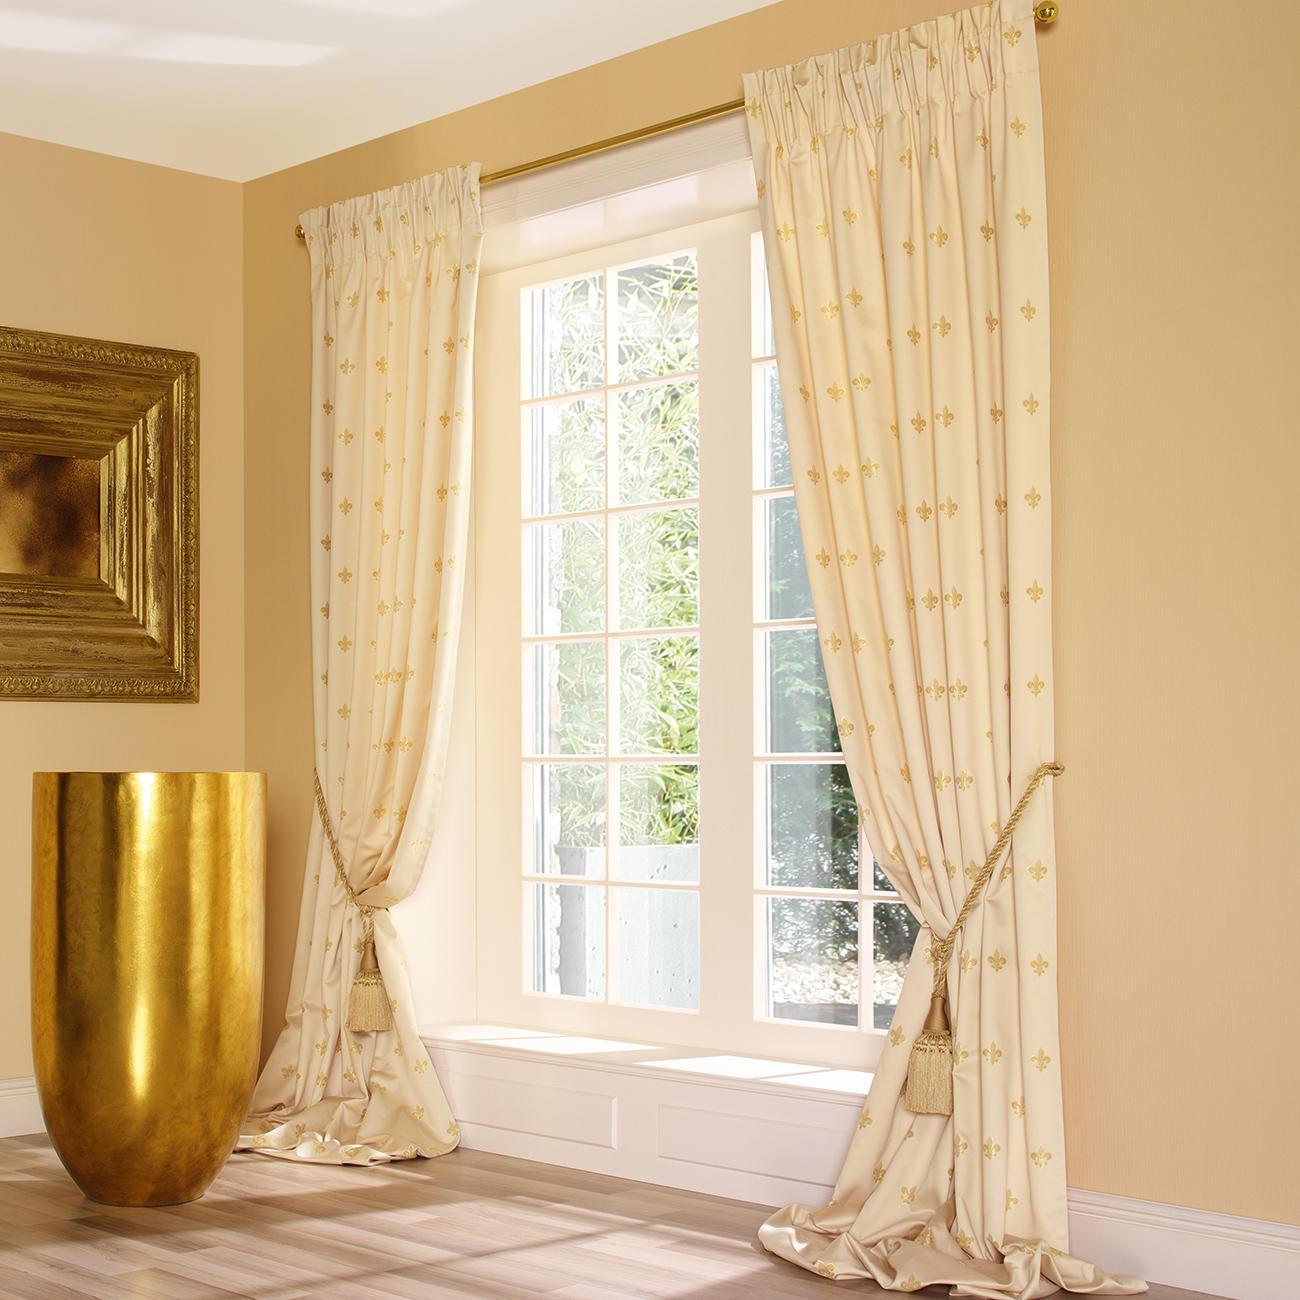 pro idee gardinen hcvc. Black Bedroom Furniture Sets. Home Design Ideas